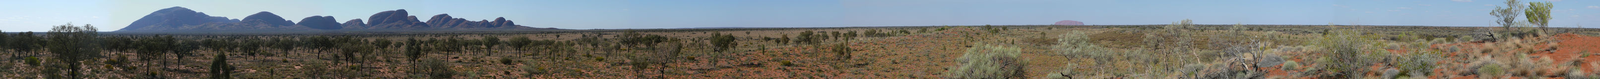 Kata Tjuta (Olgas) and Uluru (Ayers Rock) Panorama Stock Photo